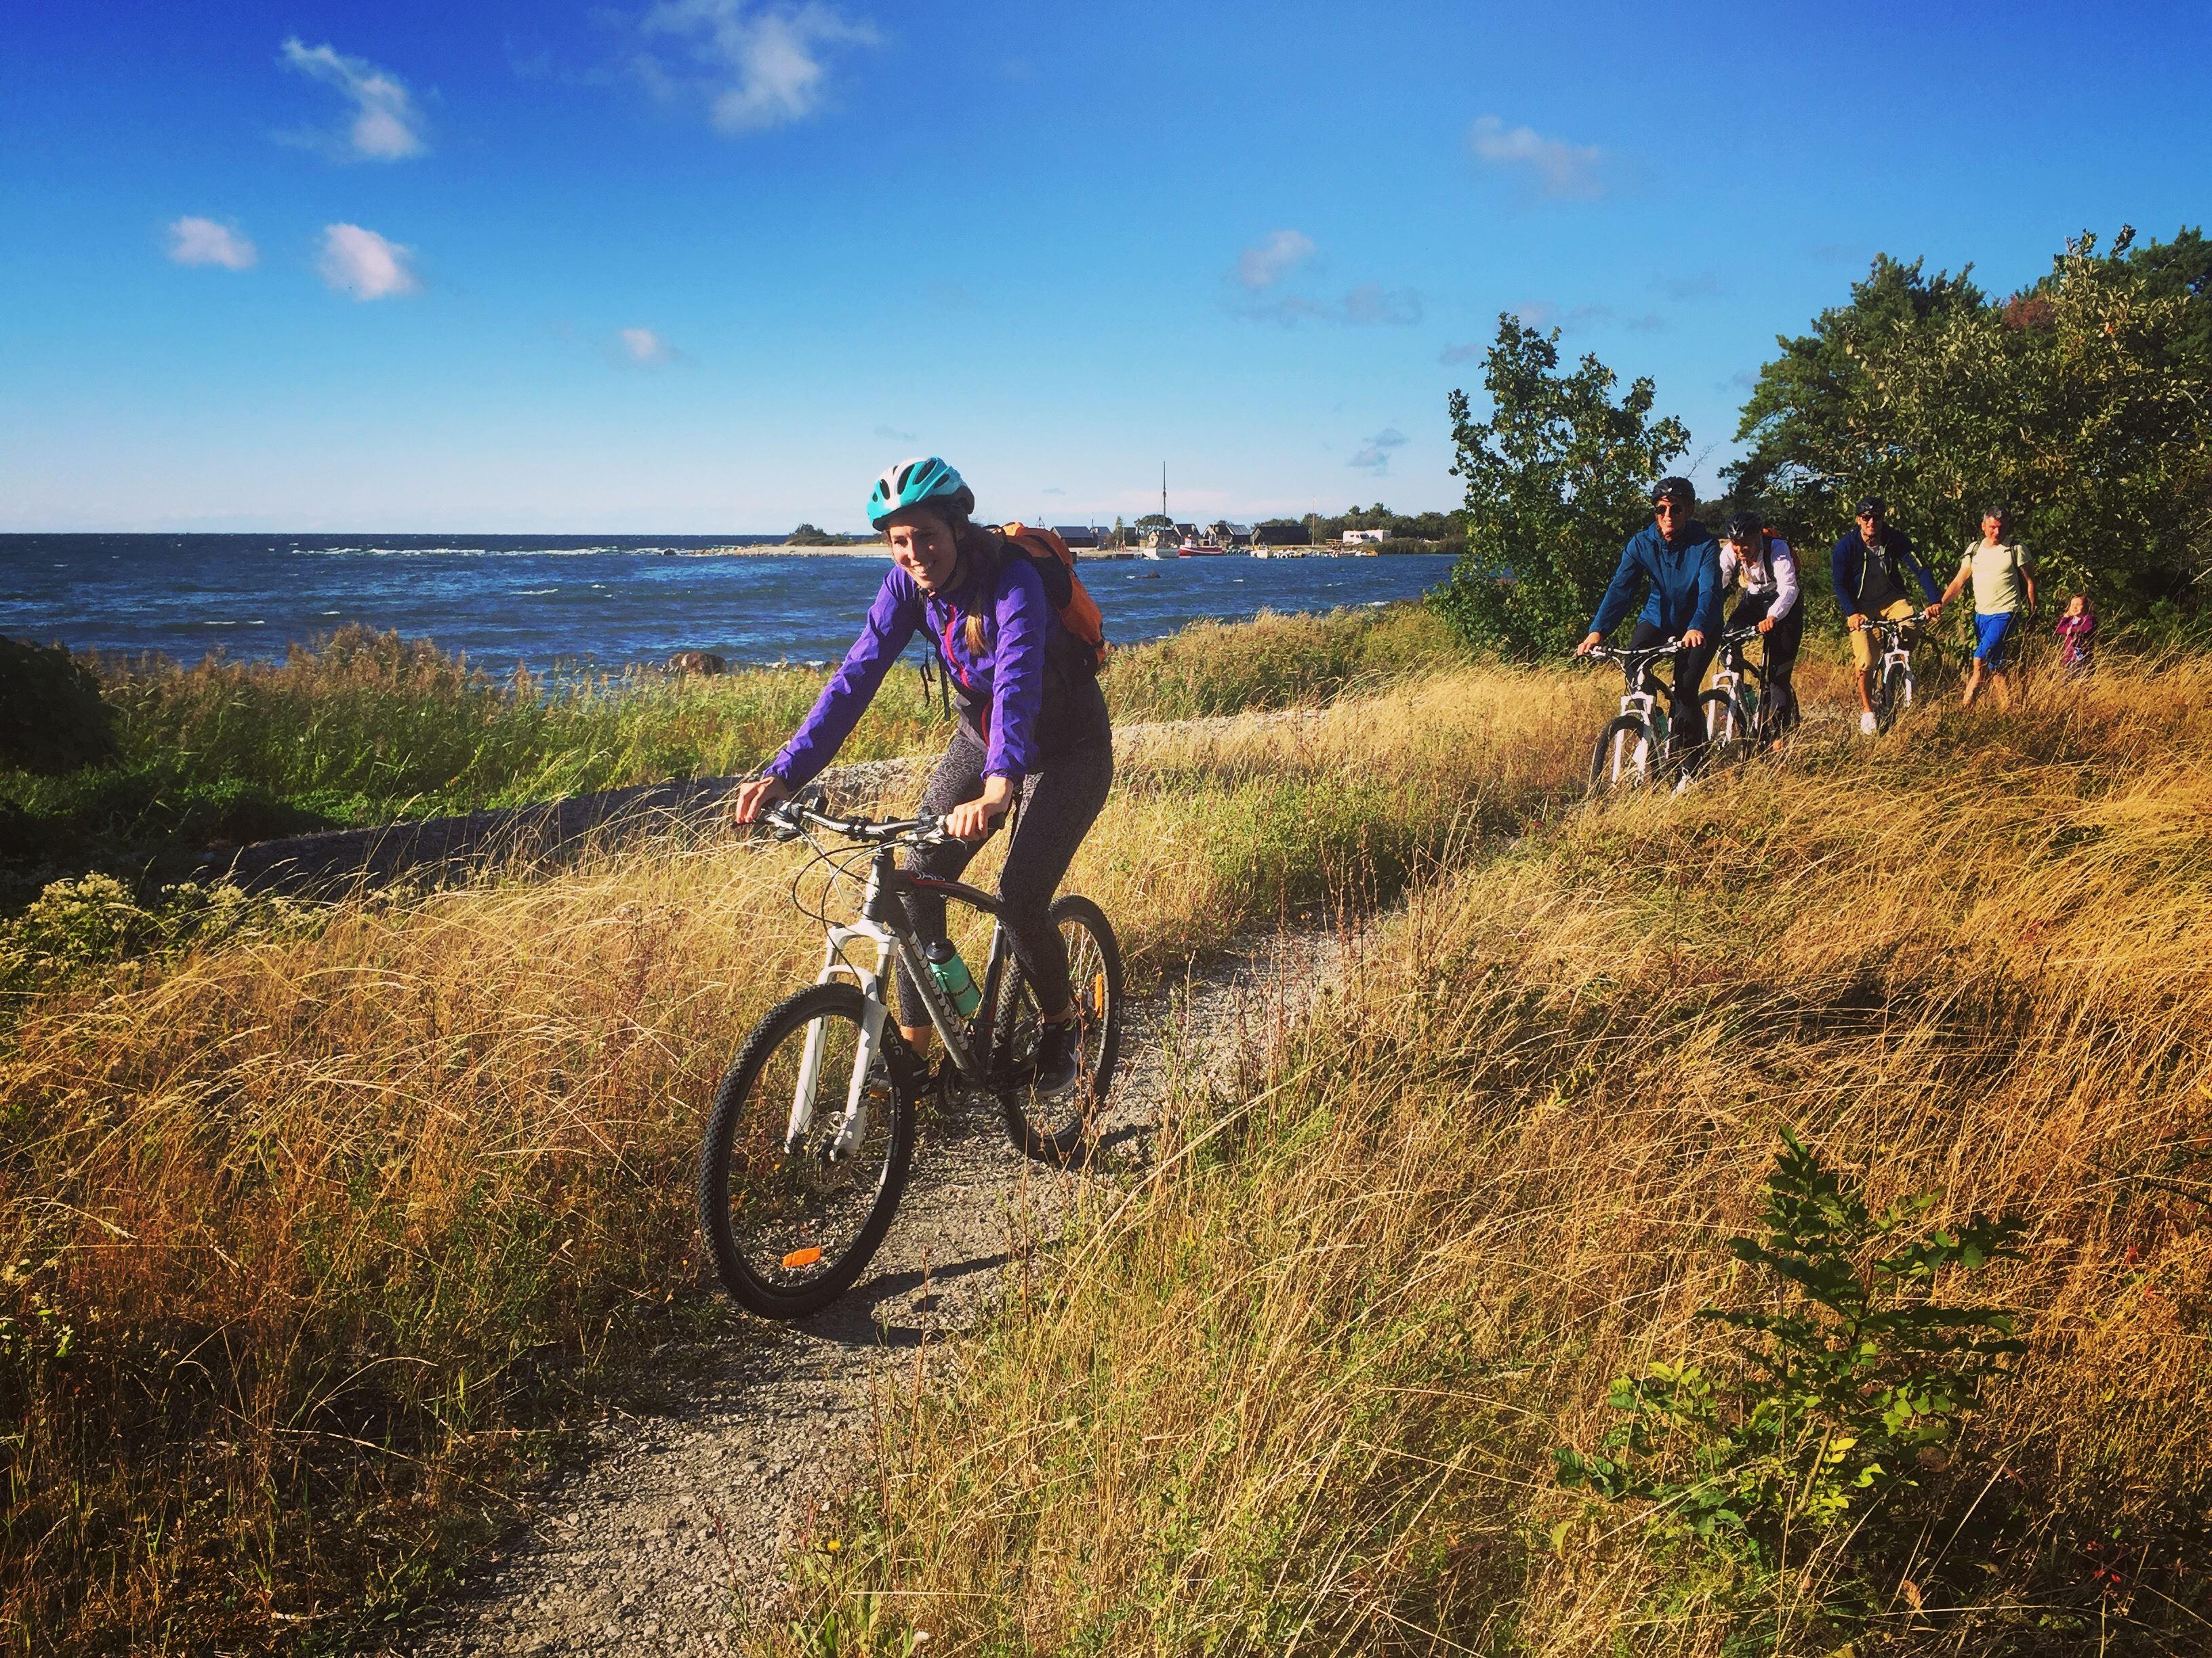 The great mountain bike ride